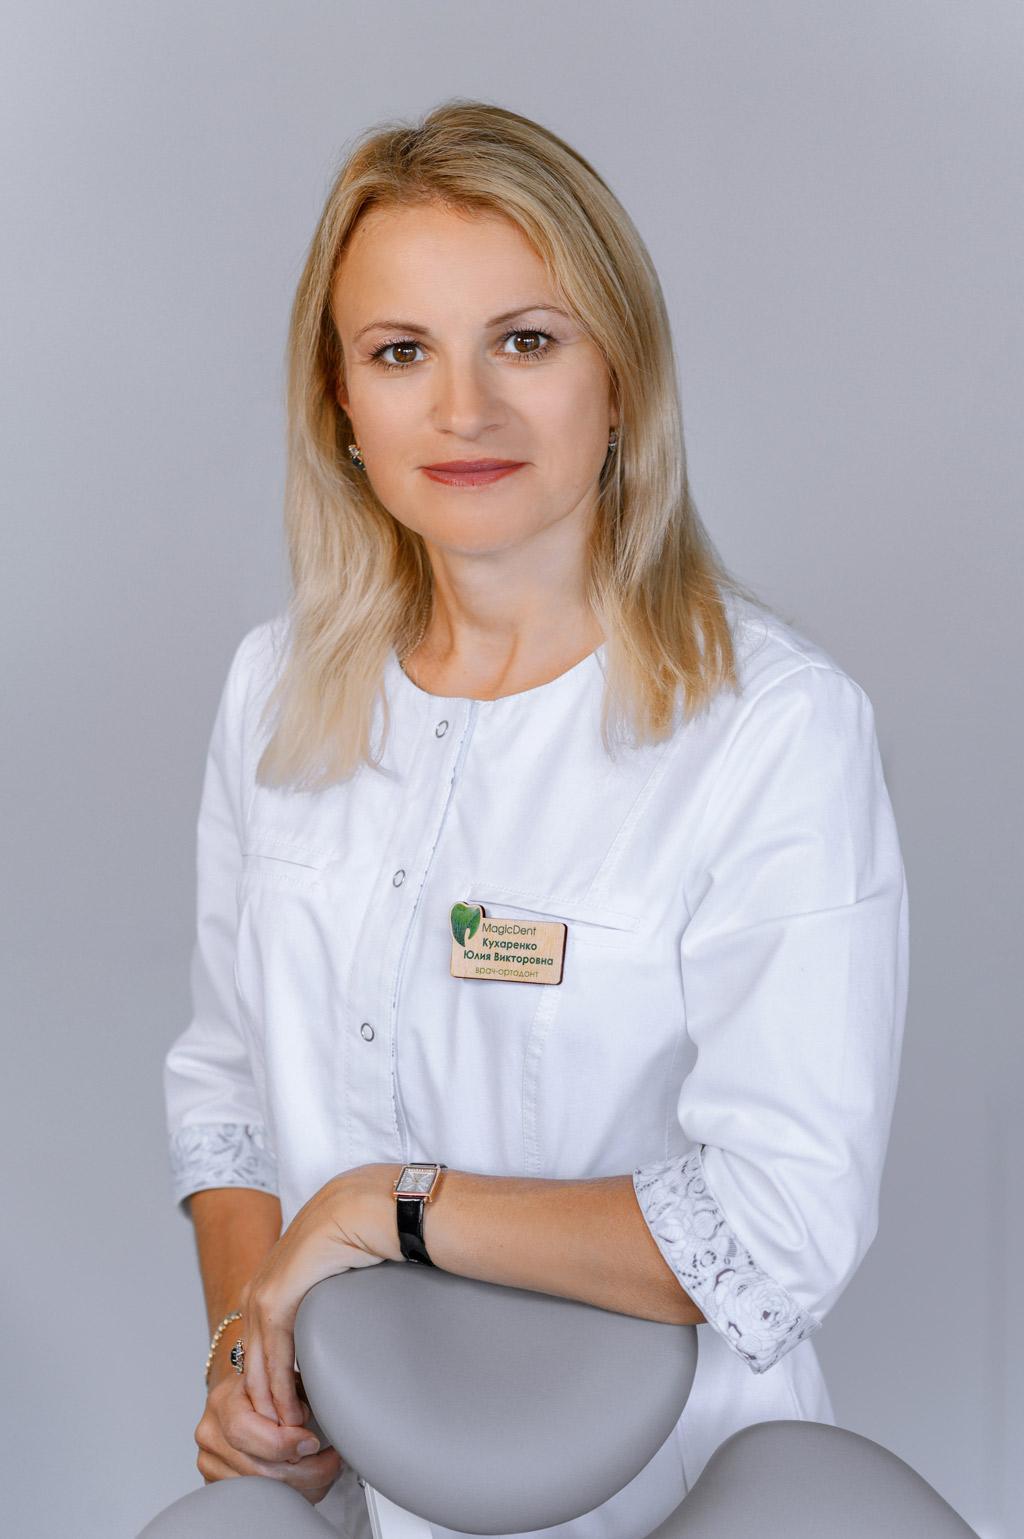 Врач-ортодонт Сочи